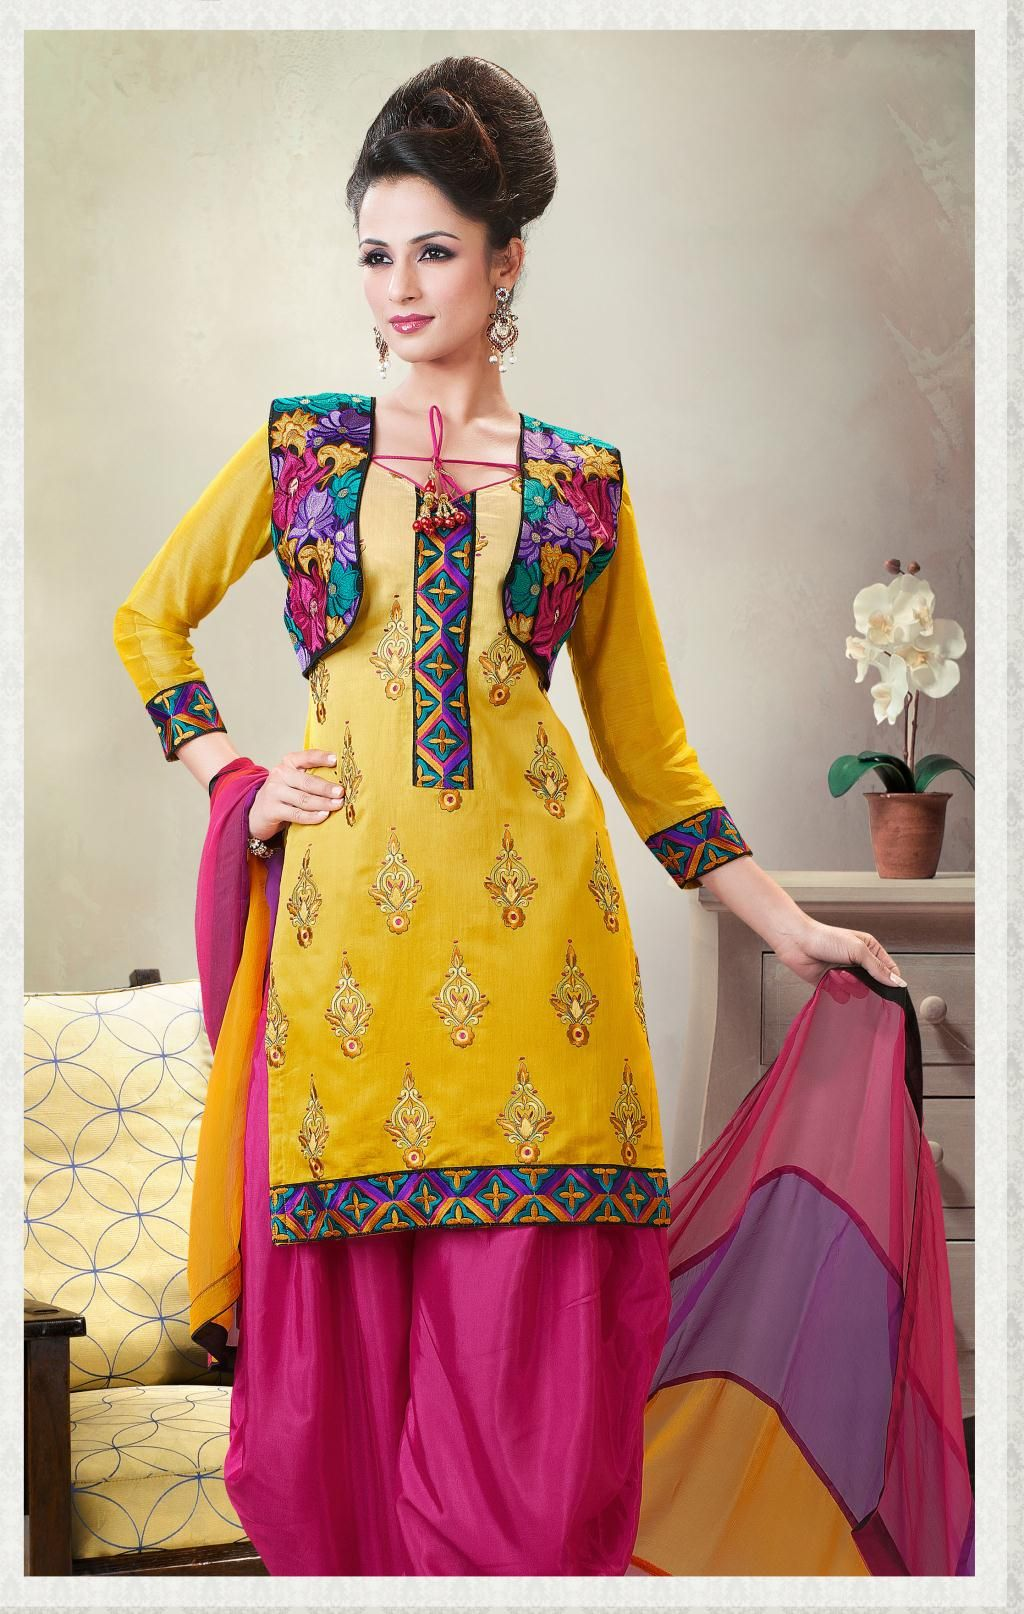 8fe3d754e7 $66.36 Gold Full Sleeve Cotton Short Salwar Kameez 21005 | Shhm love ...